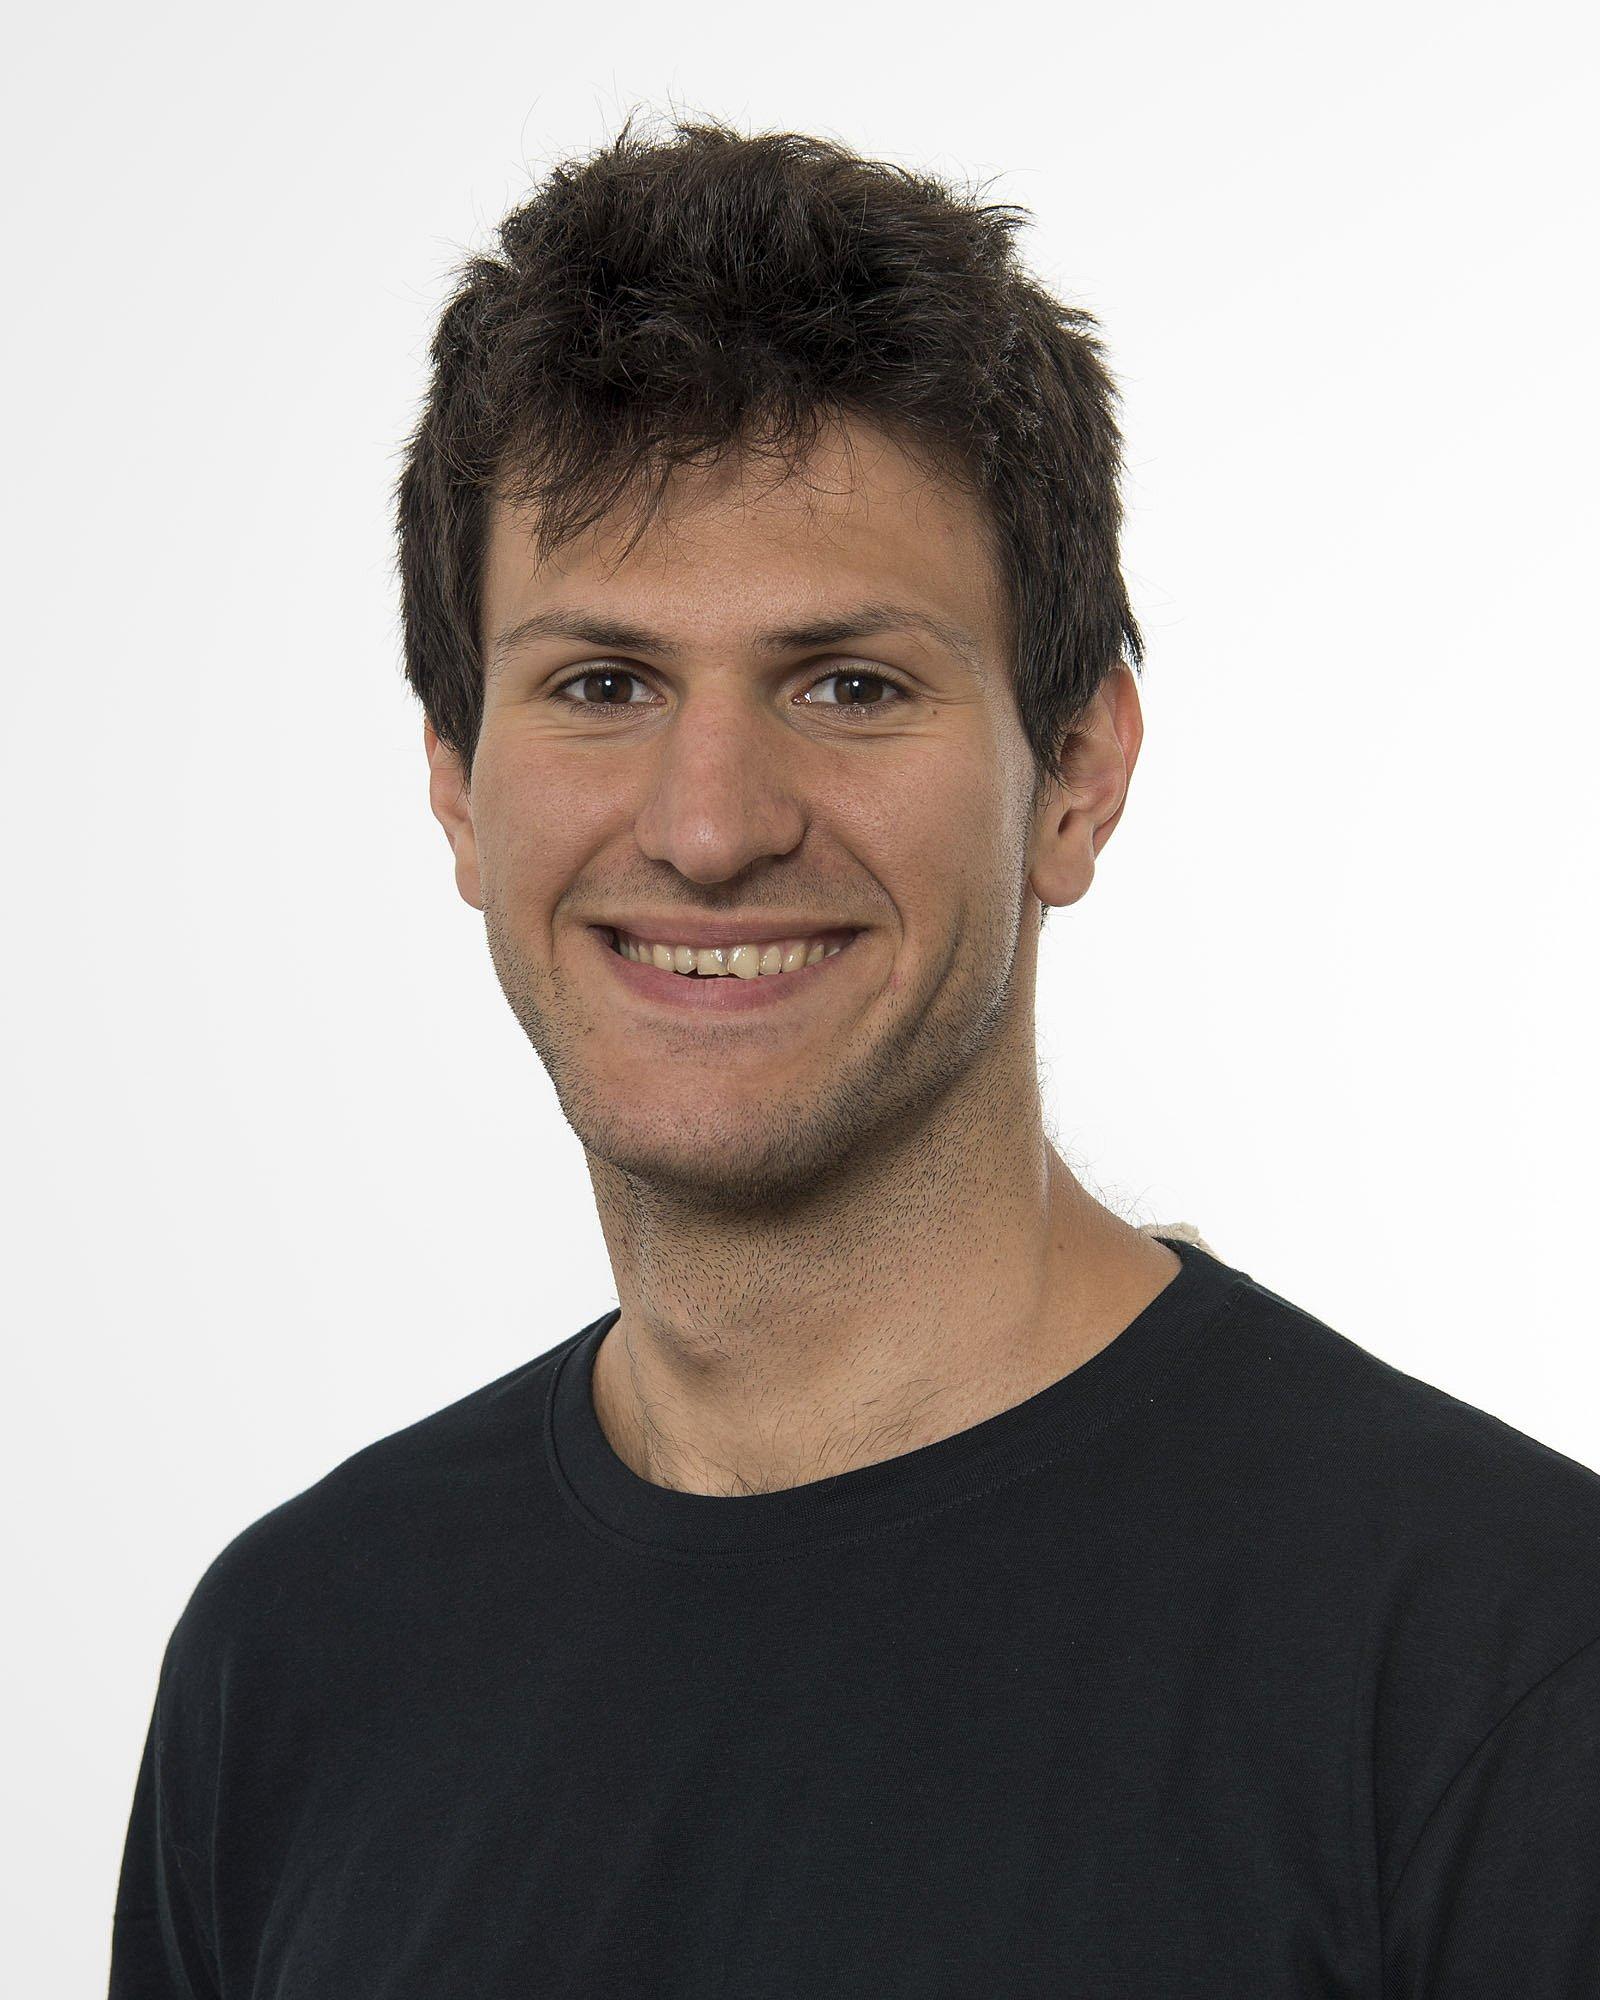 Milan Radenovic